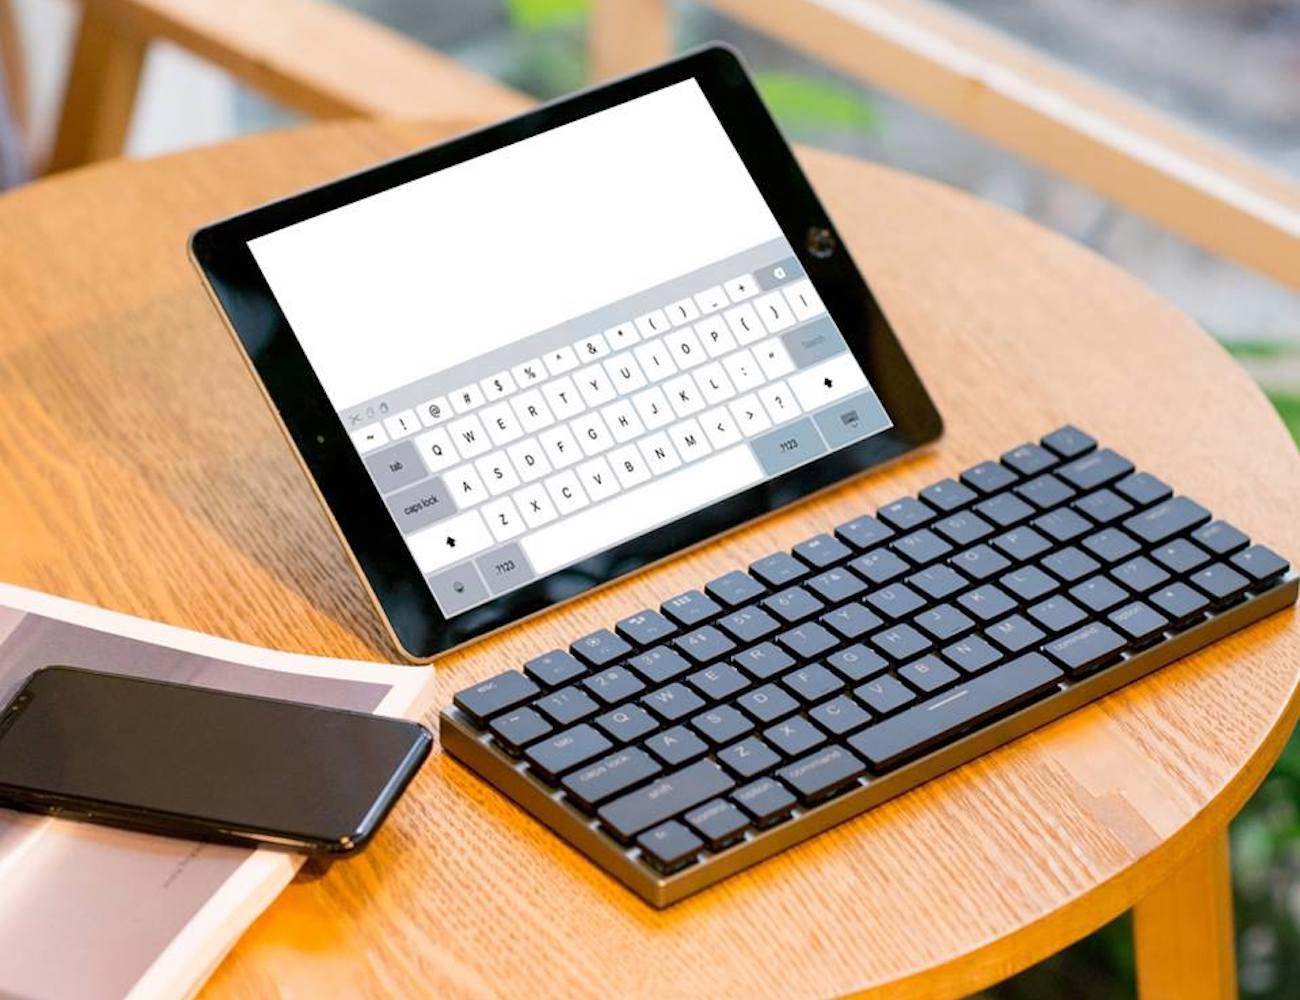 Vinpok Taptek Slim Wireless Mechanical Keyboard